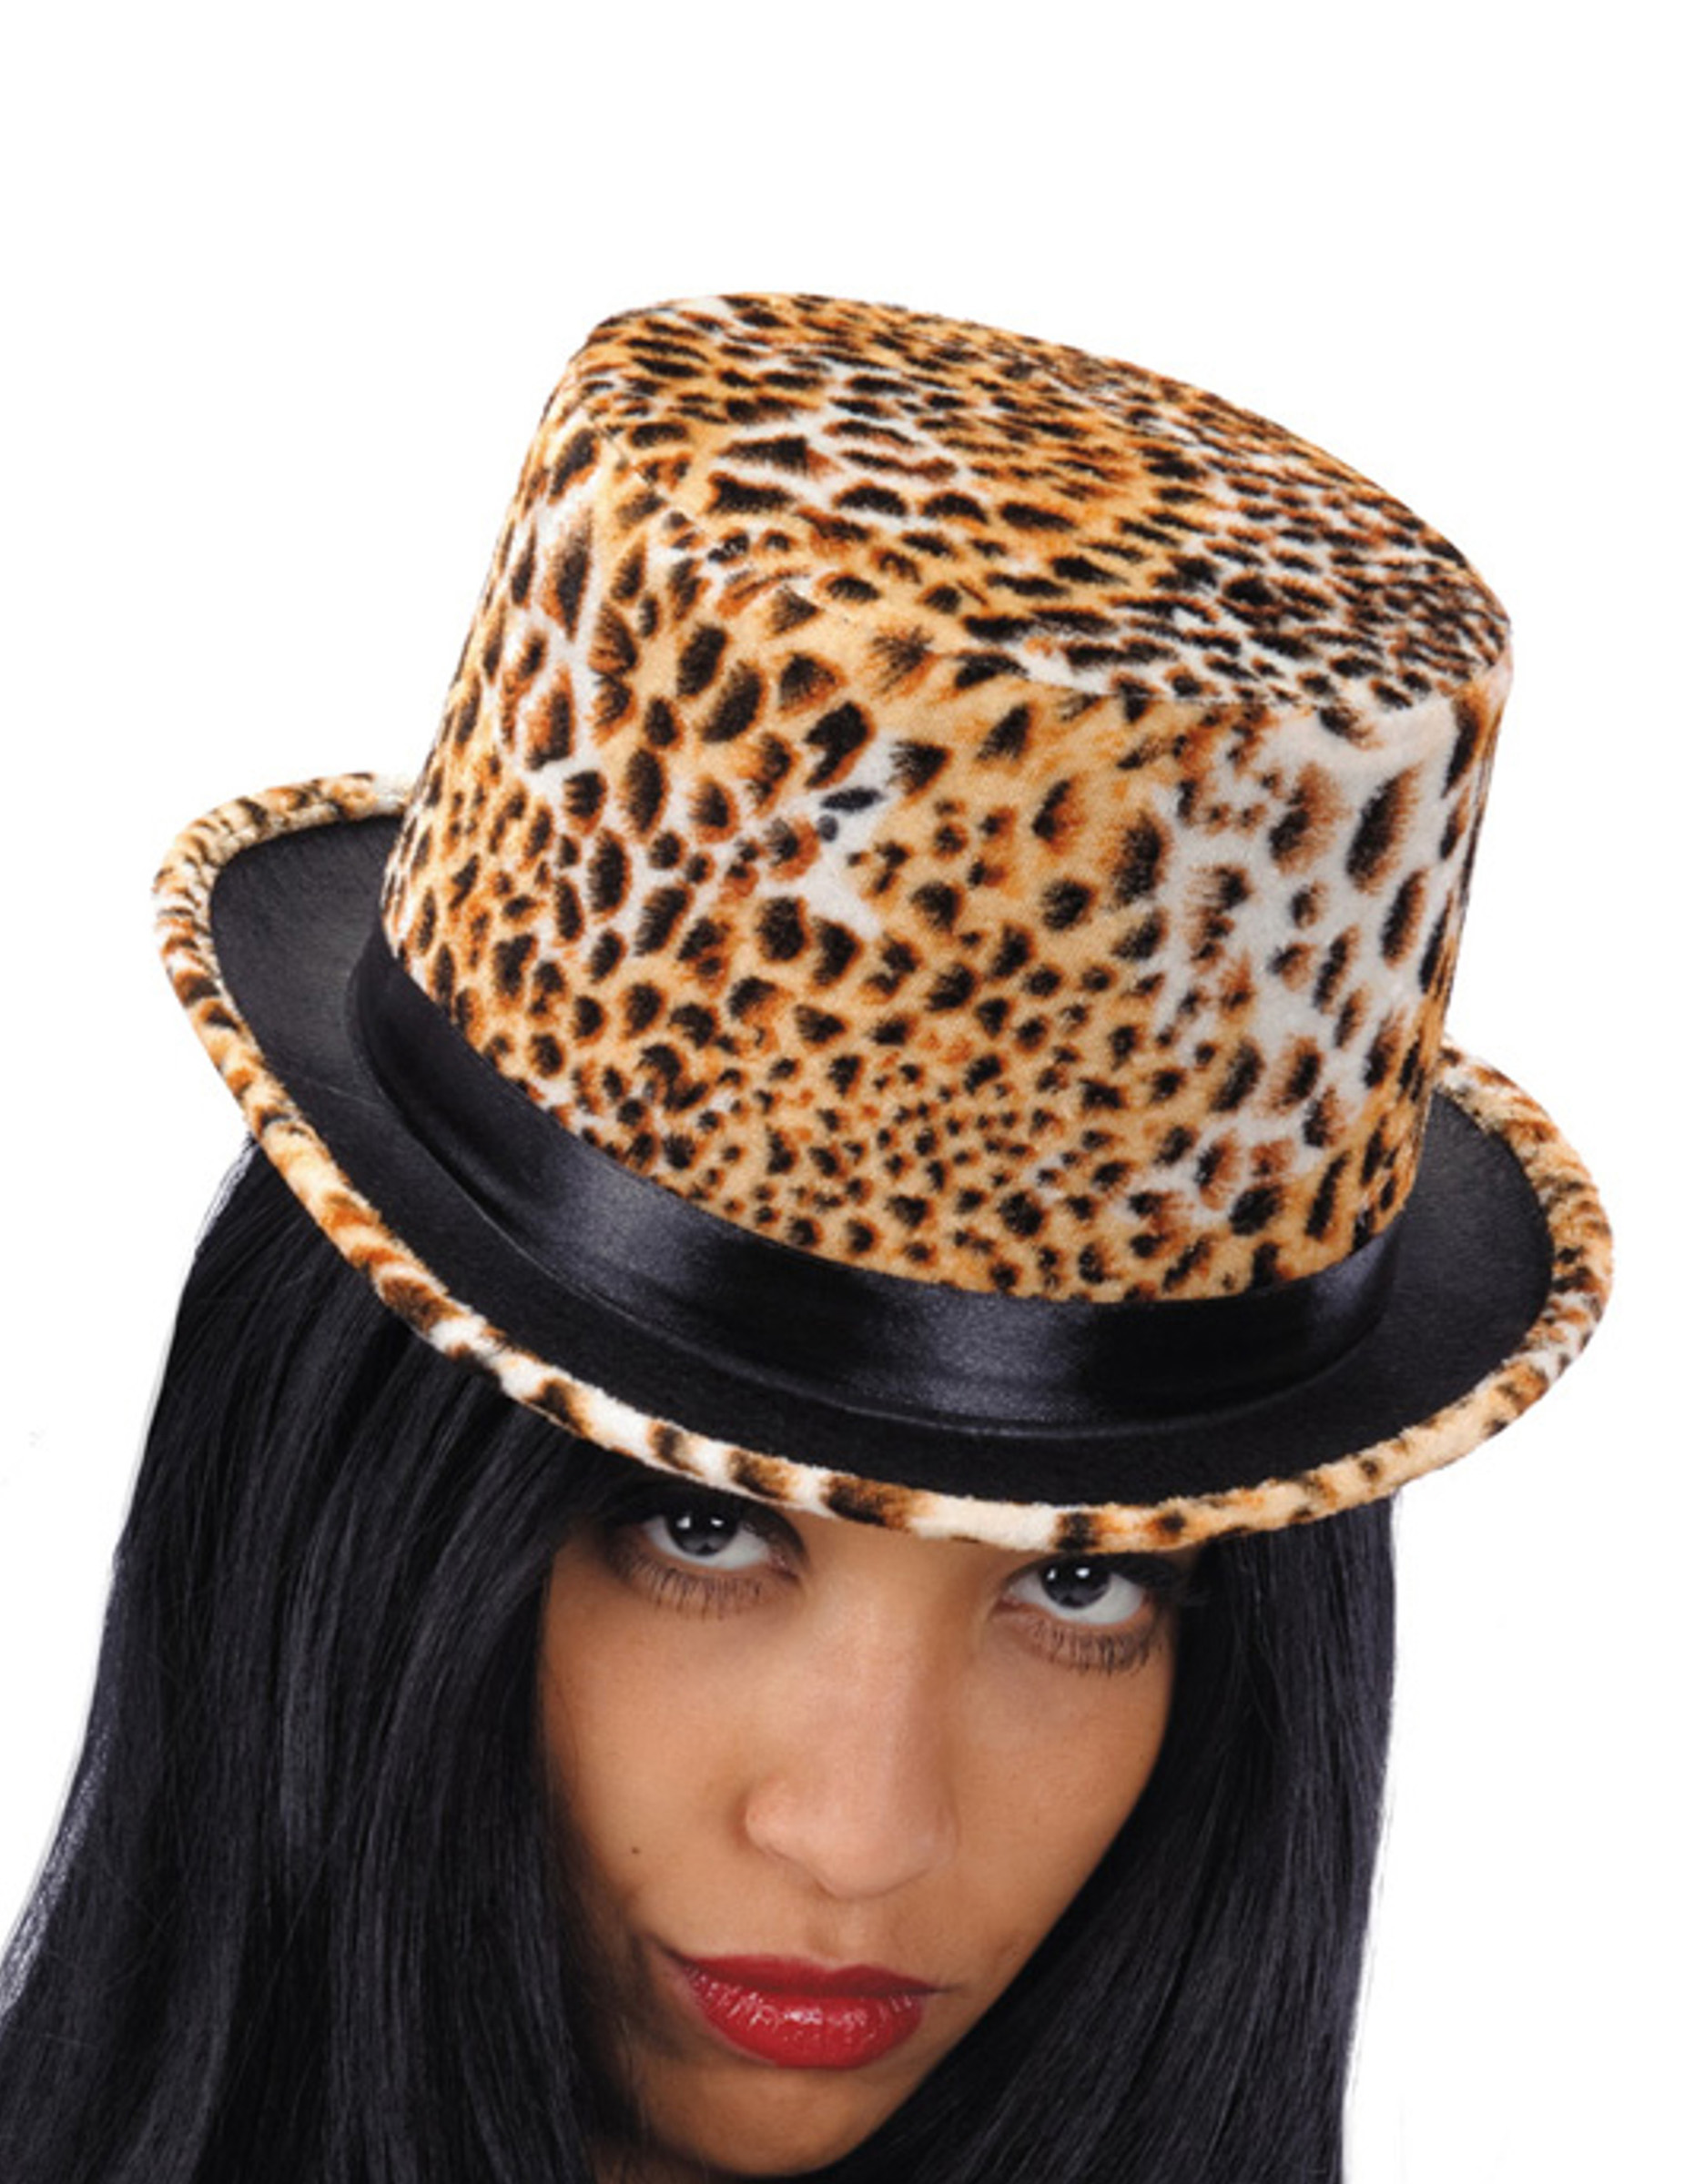 leoparden hut f r damen h te und g nstige faschingskost me vegaoo. Black Bedroom Furniture Sets. Home Design Ideas